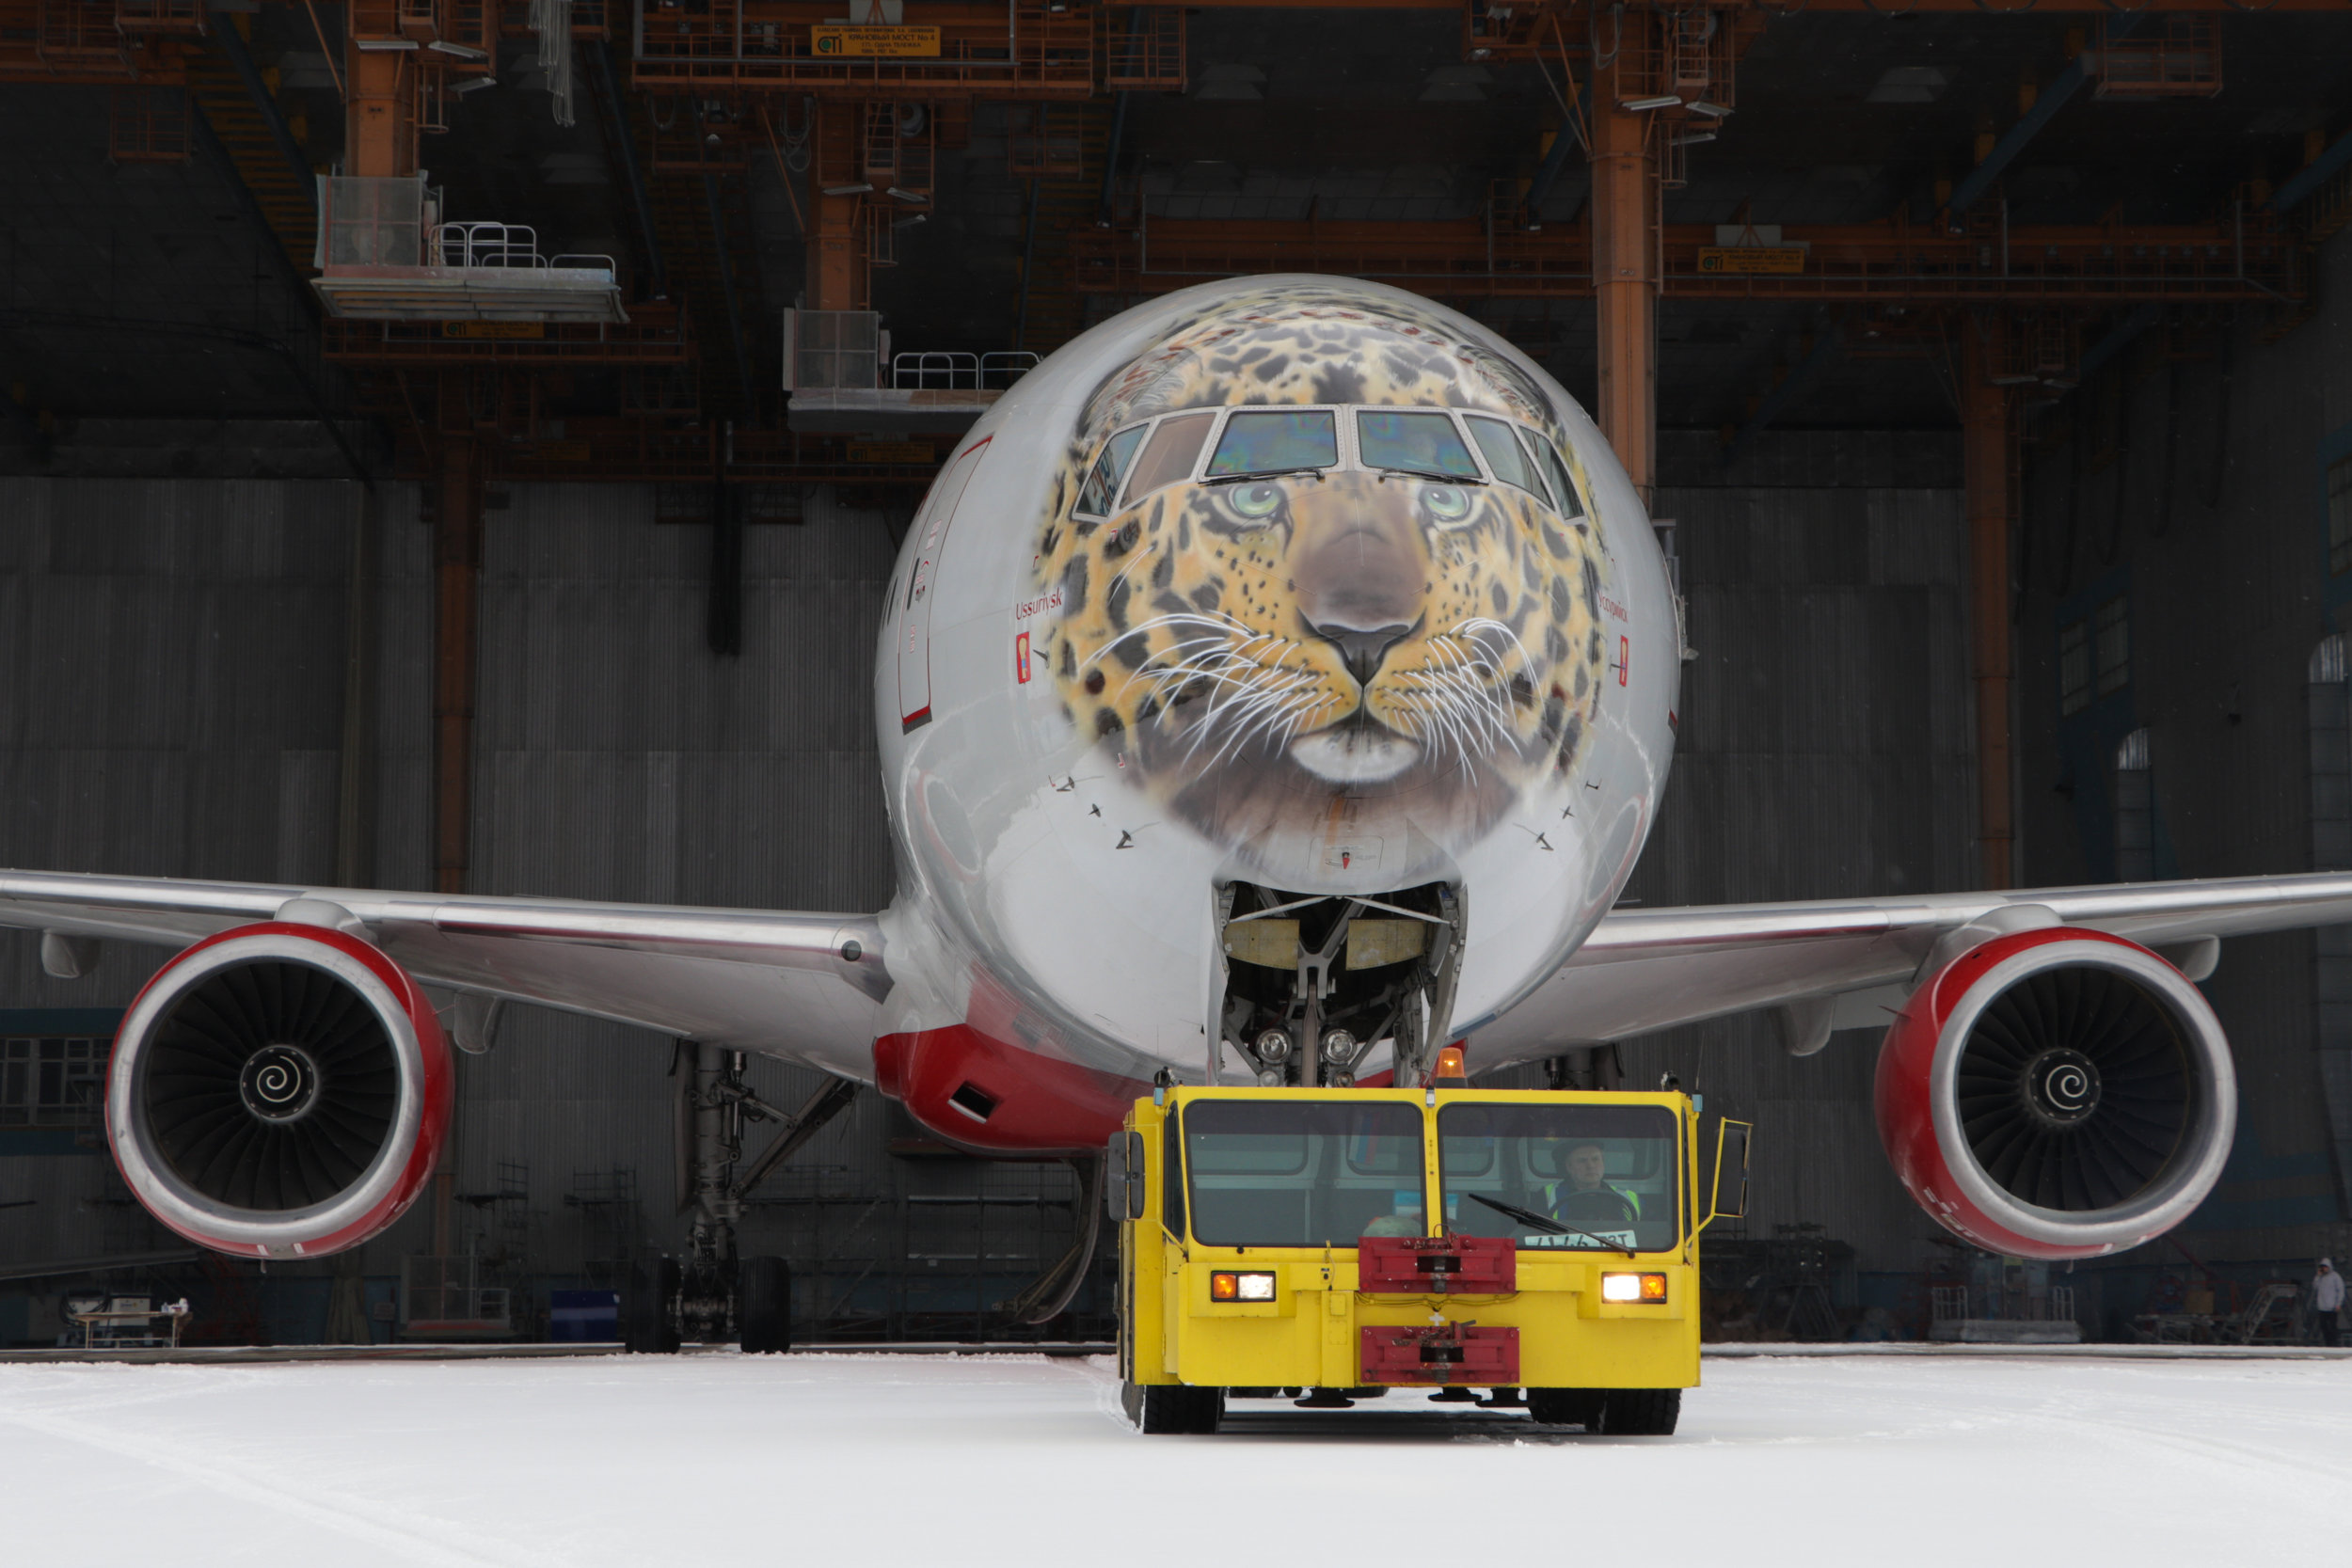 Rossyia Tigrolet B777 leopard livery